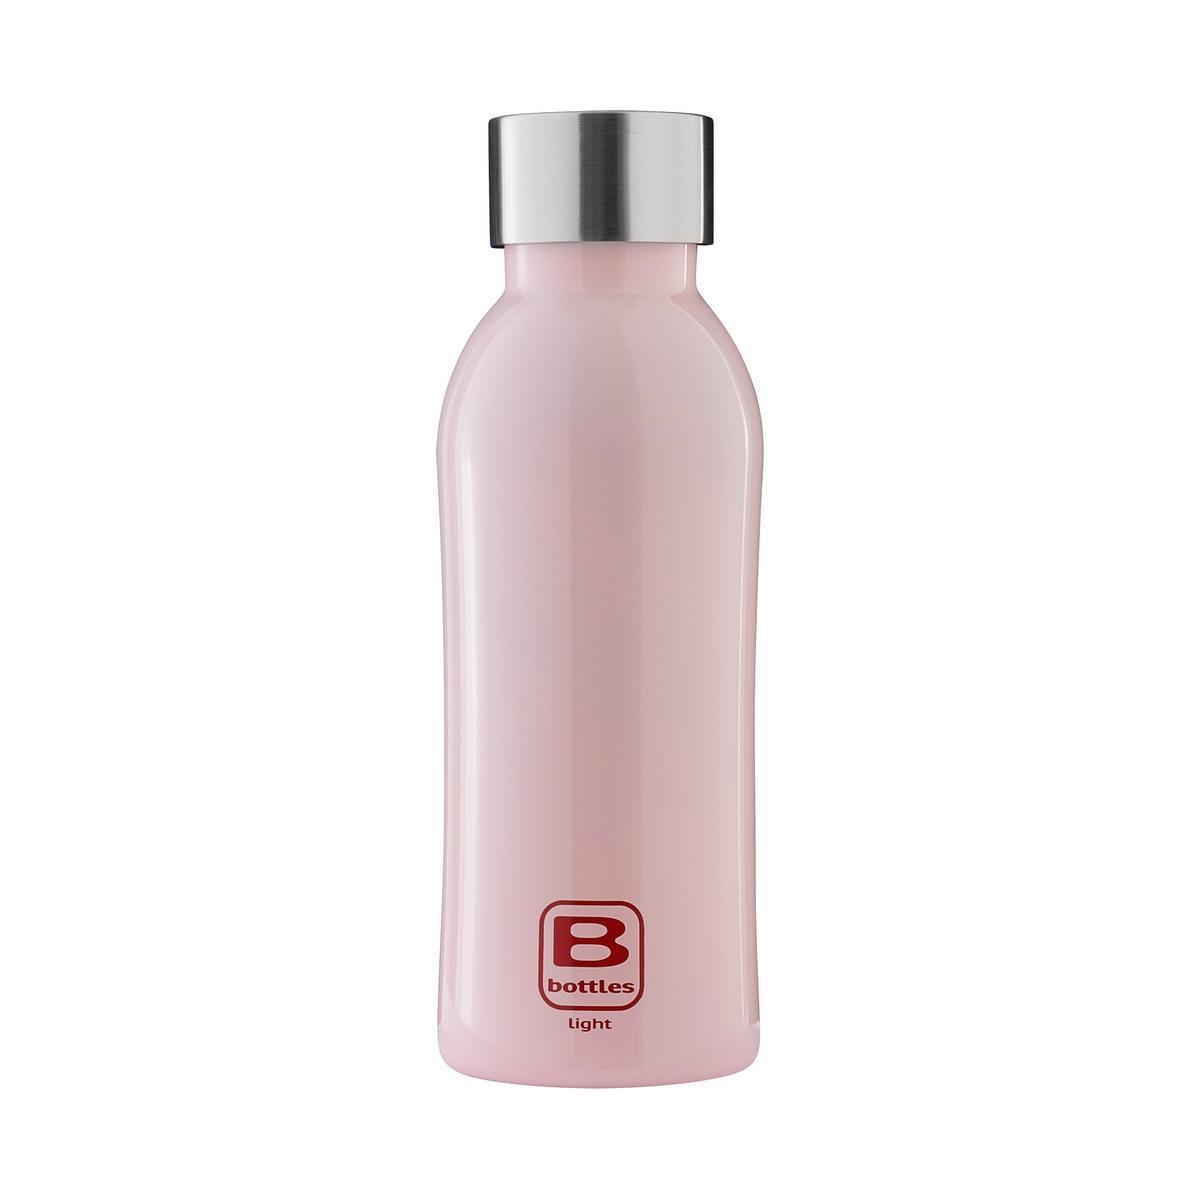 B Bottles Light - Pink - 530 ml - Bottiglia in acciaio inox 18/10 ultra leggera e compatta